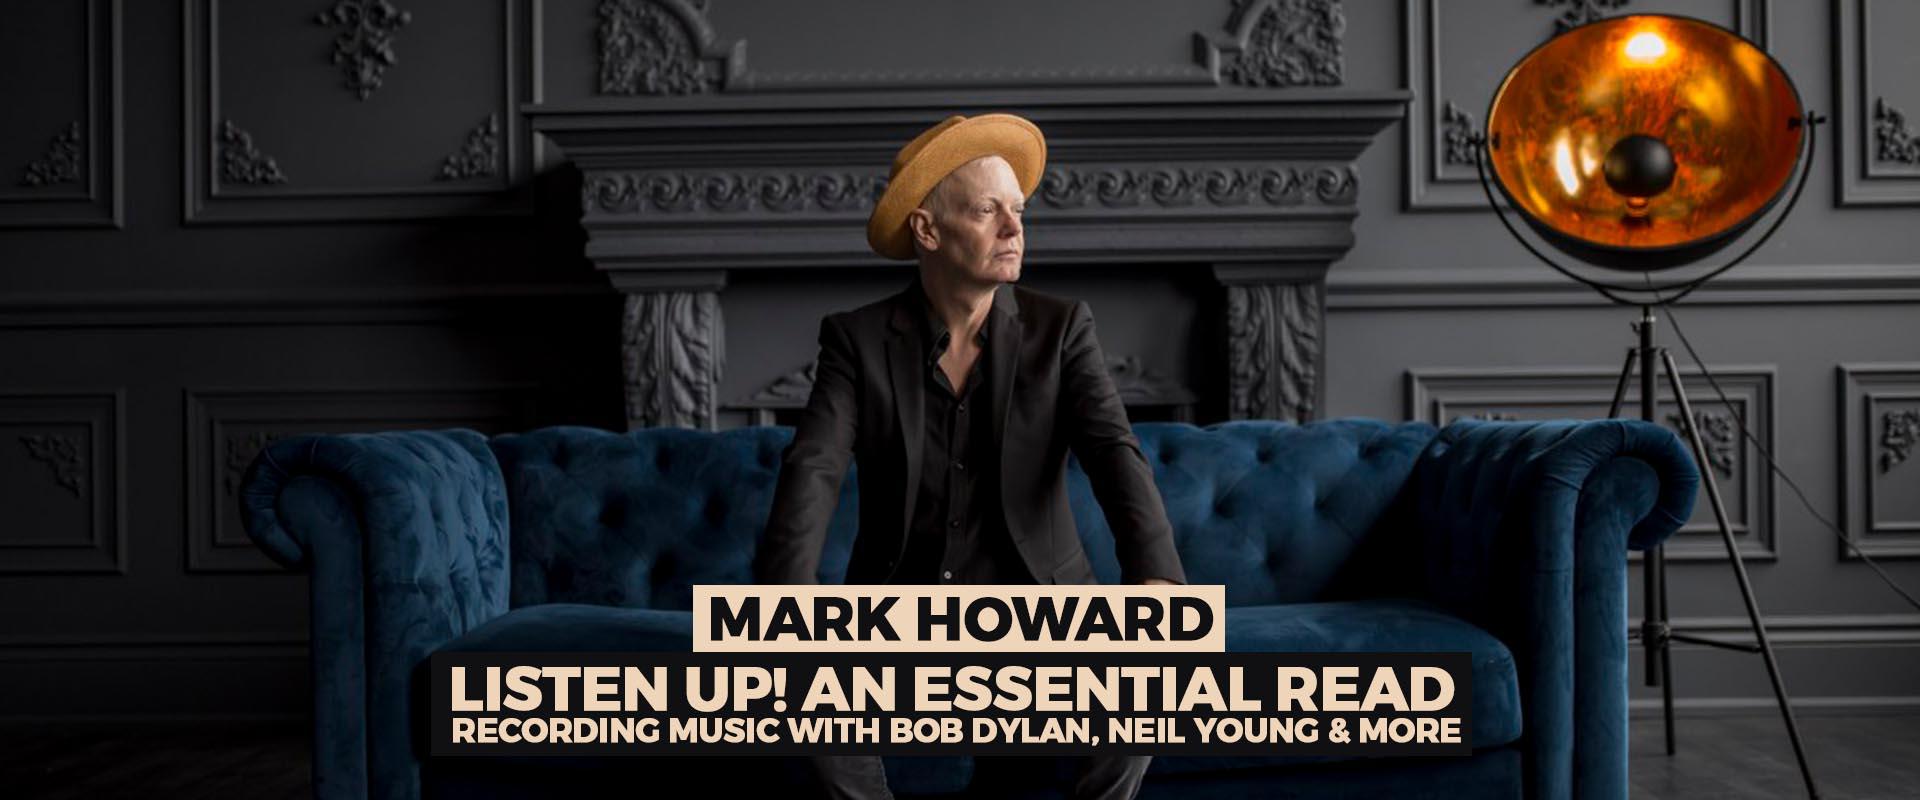 Mark Howard - Listen Up